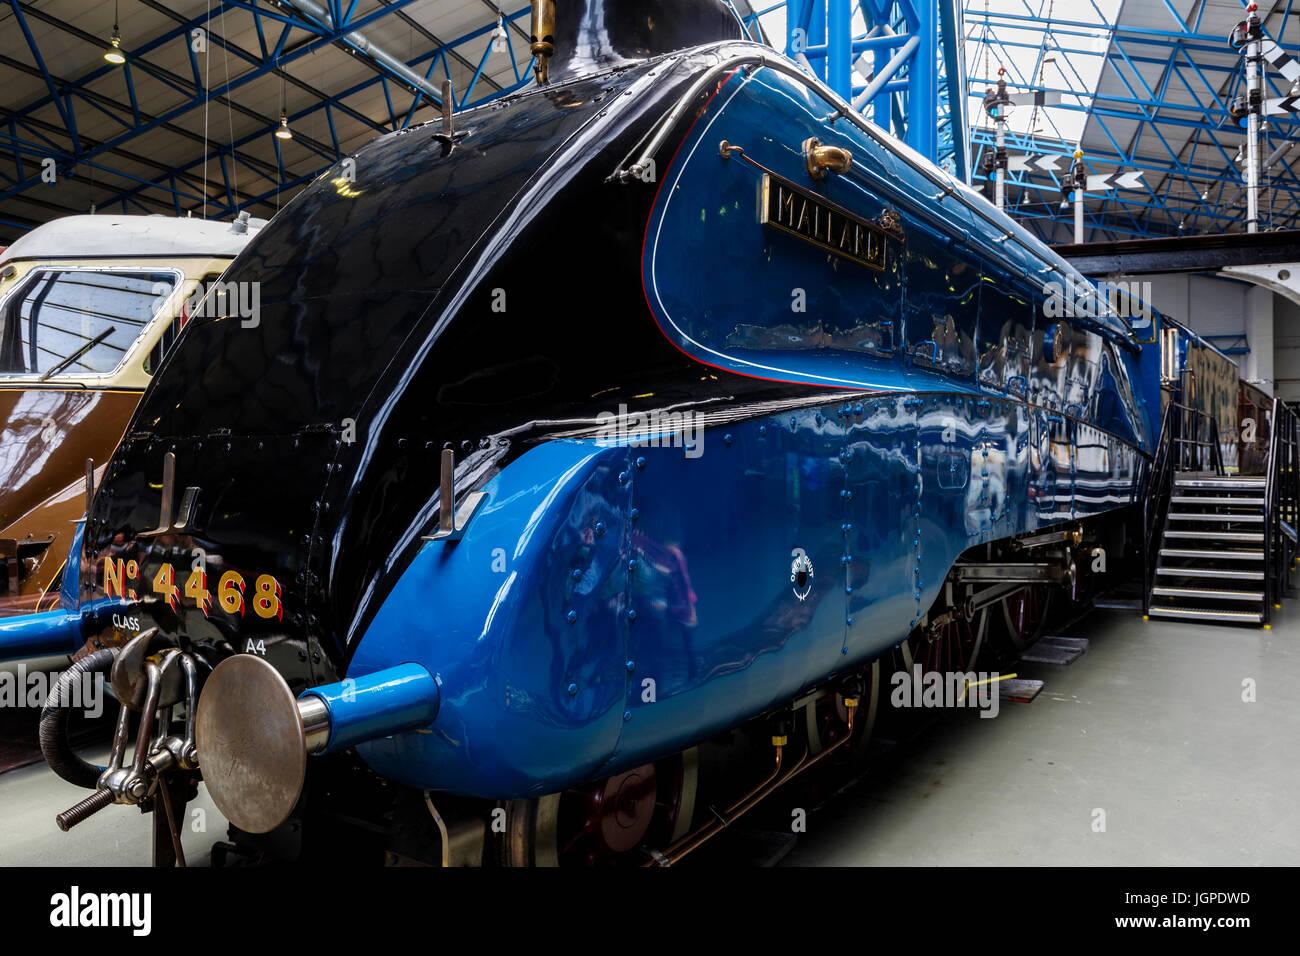 'Mallard' train, Great Hall, National Railway Museum, York, Yorkshire, England, United Kingdom - Stock Image